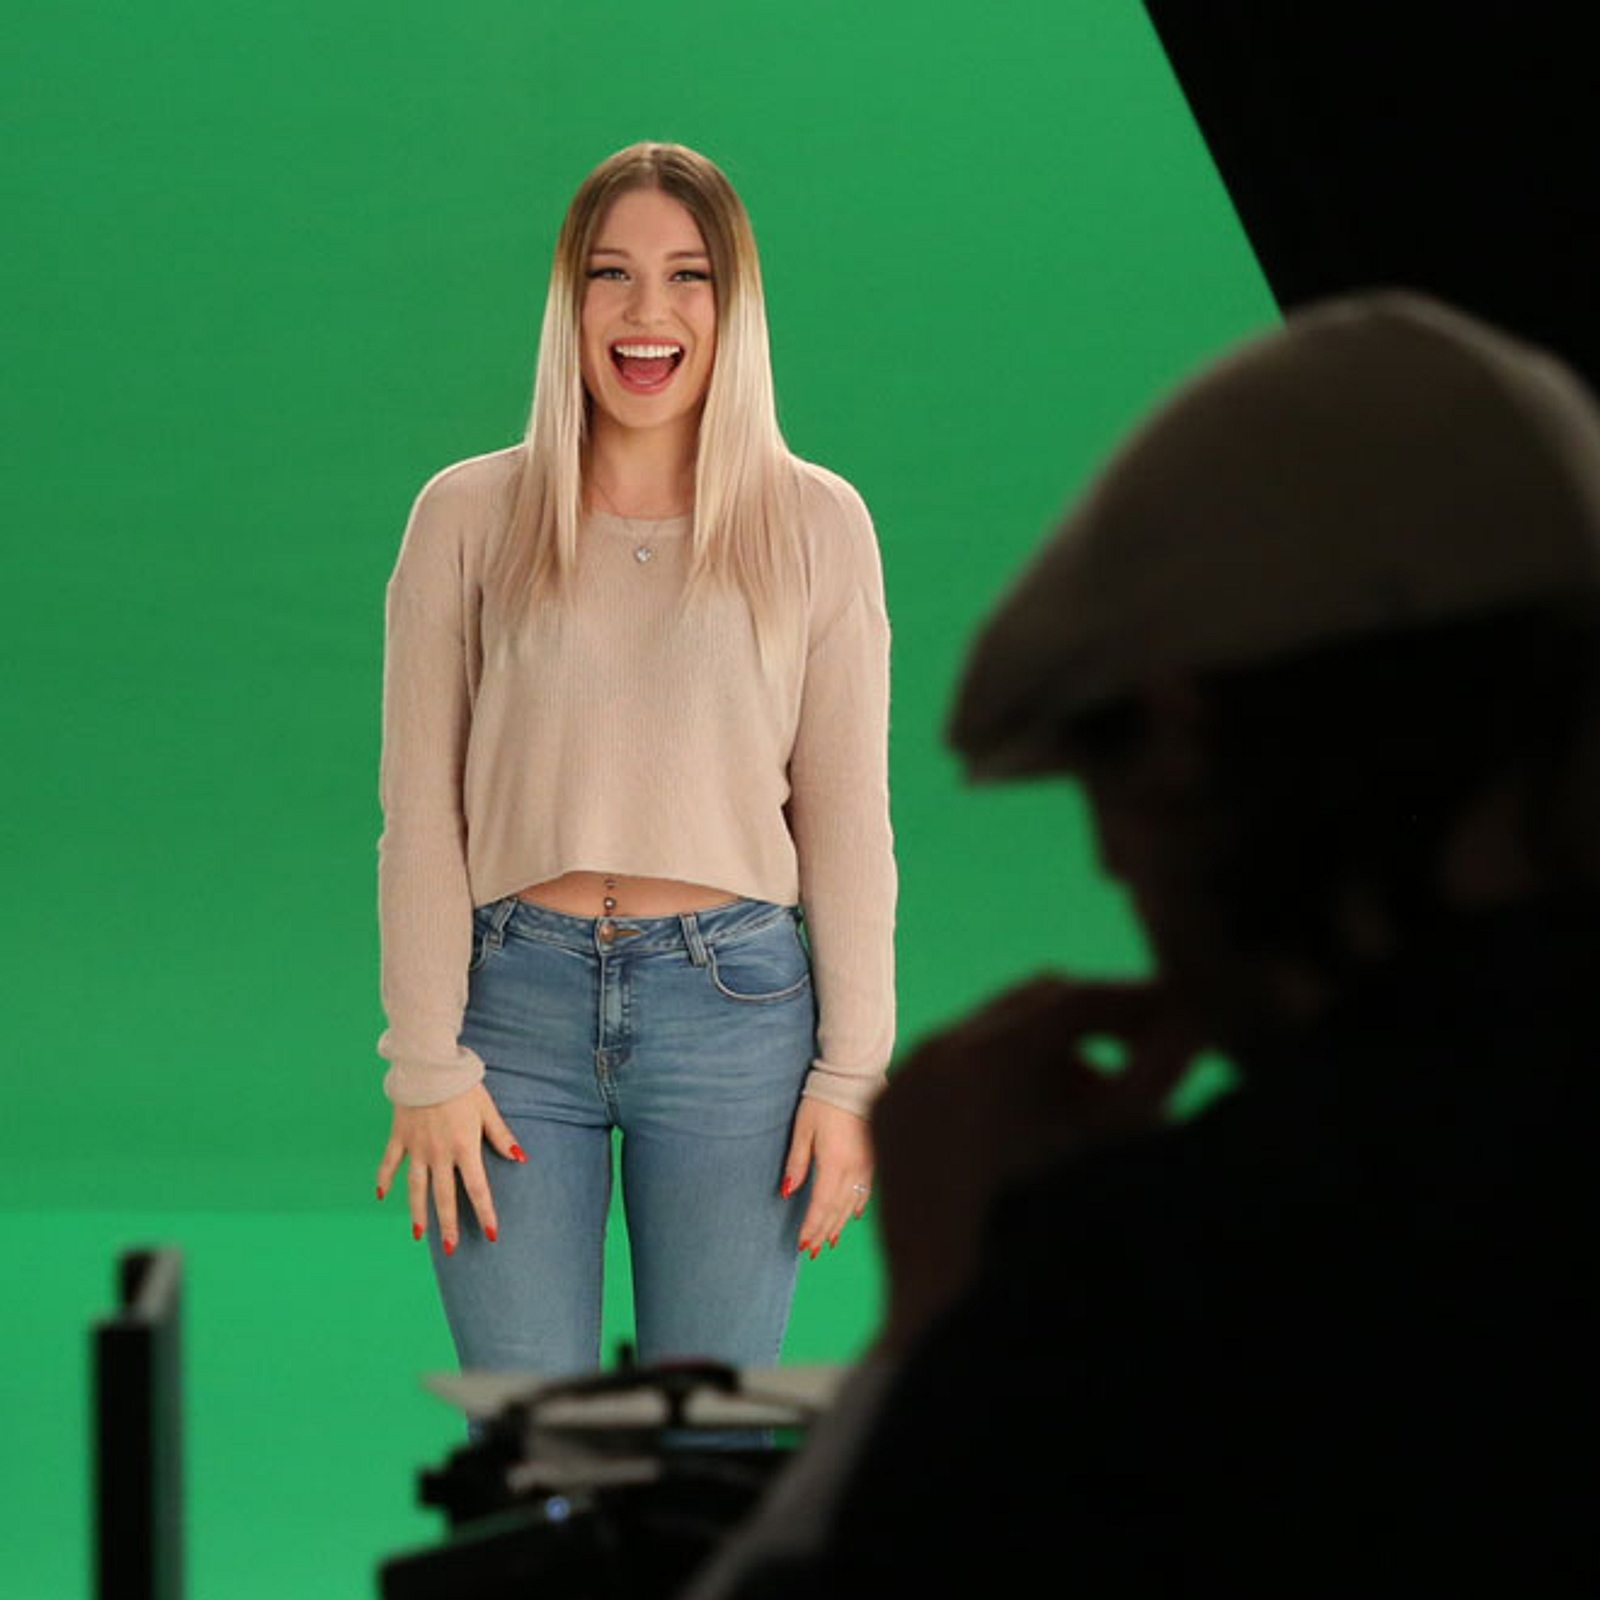 Bibis Beauty Palace: Bianca Heinicke wird weltweit erstes